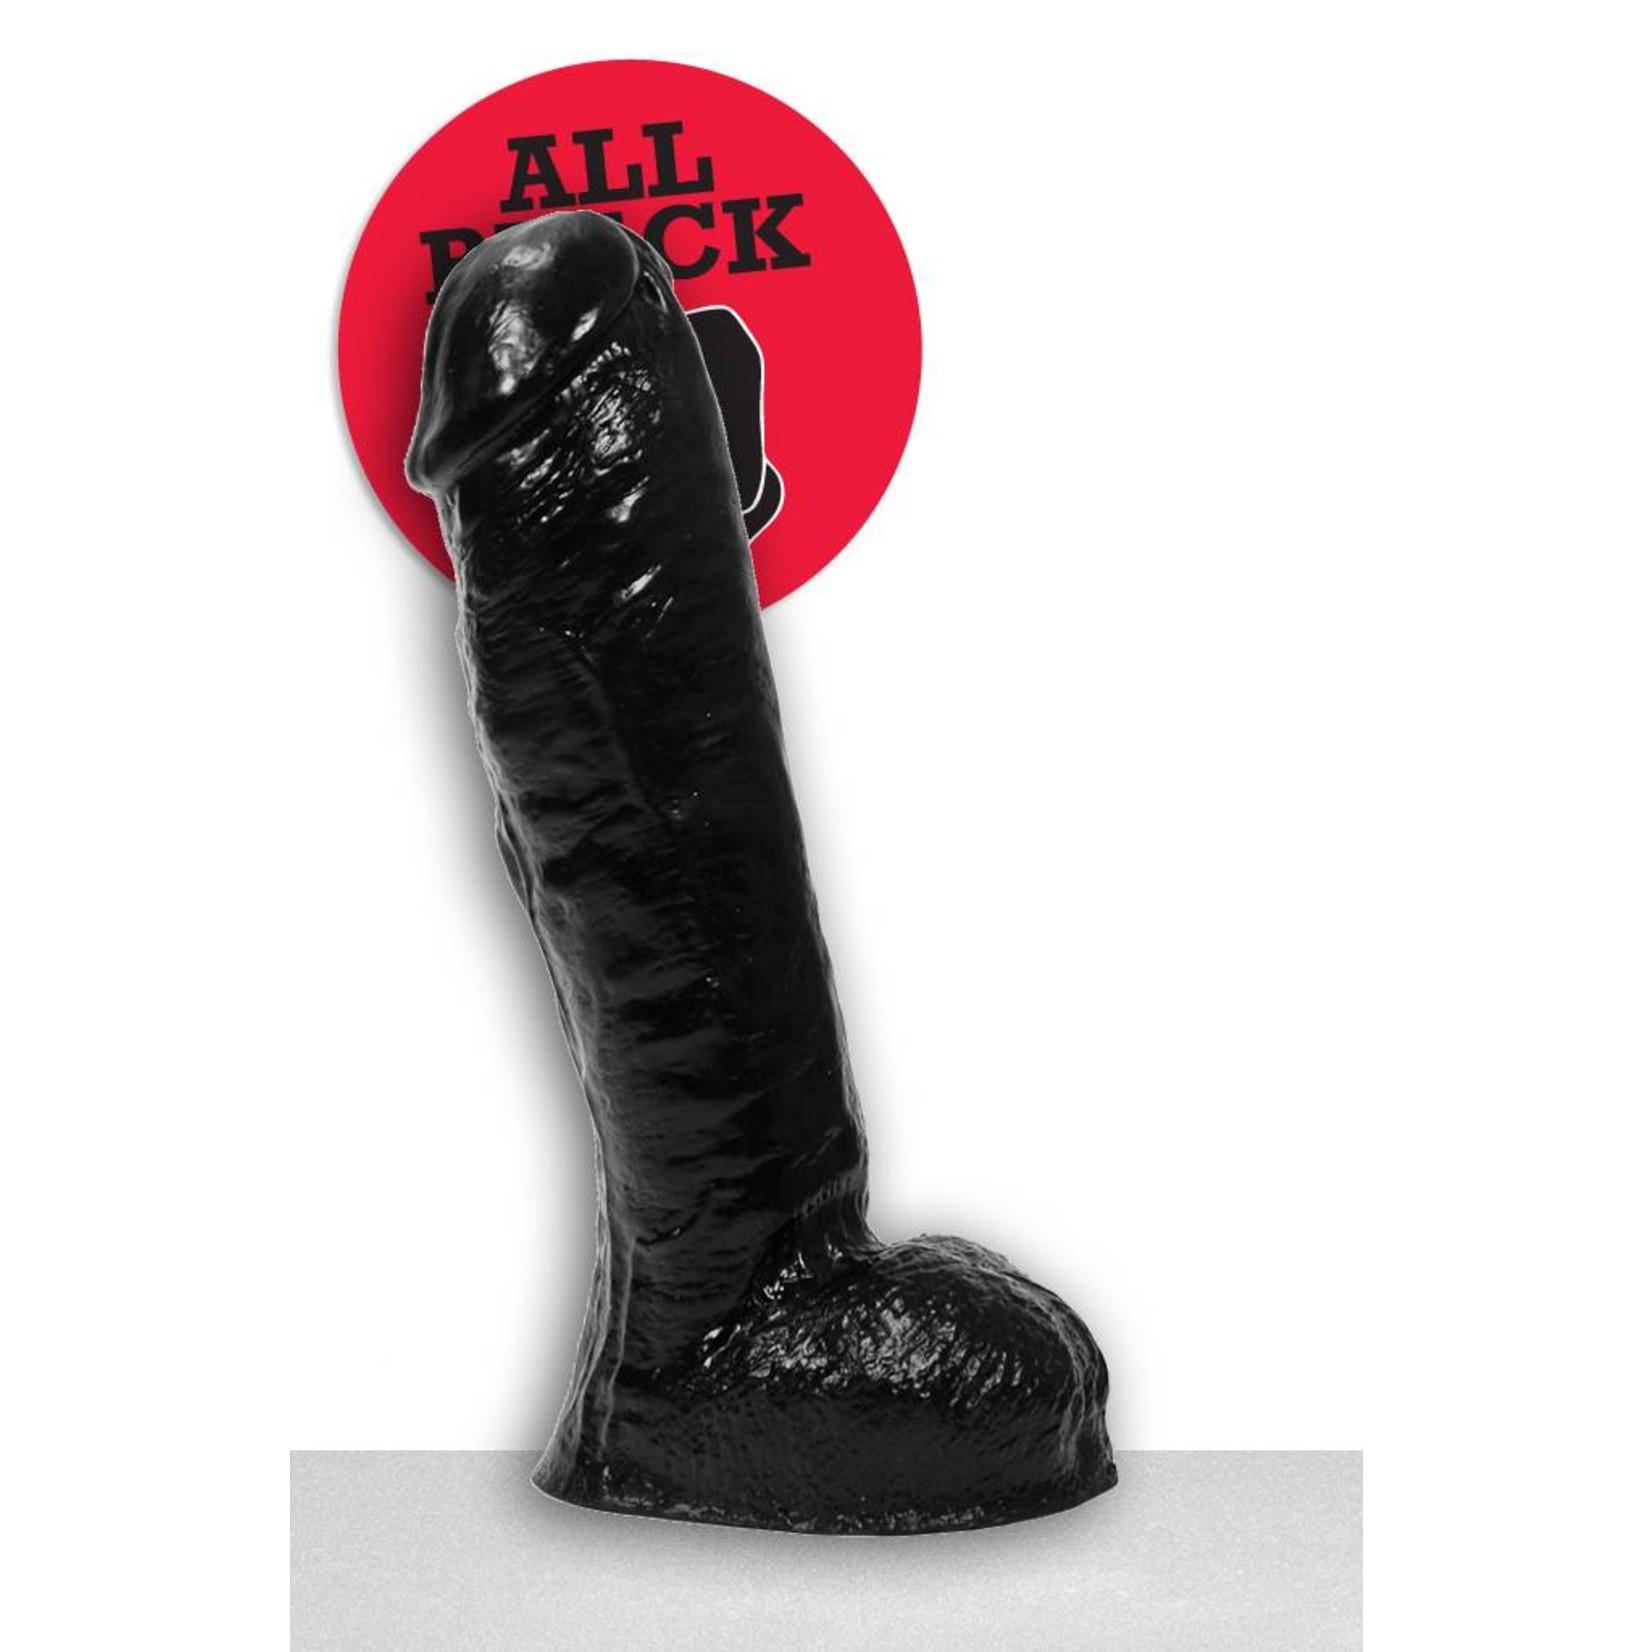 All Black All Black Dildo - AB 34